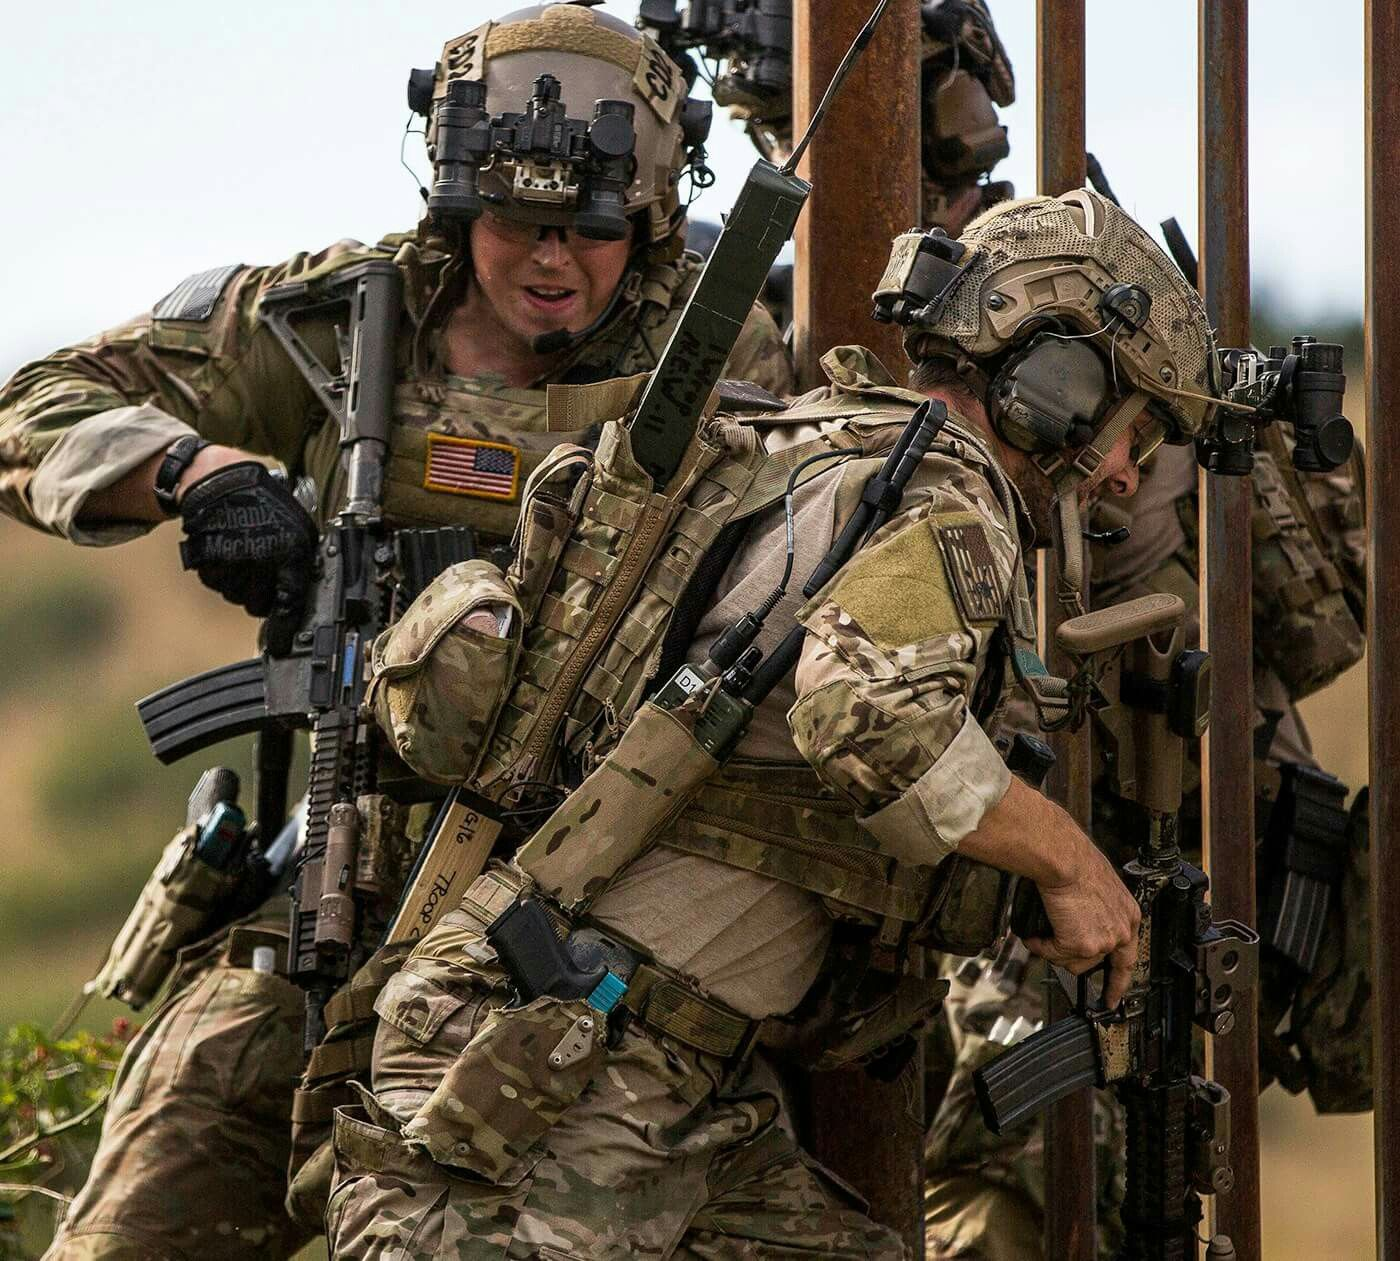 Jackal Stone 2016 空軍, 兵士, 特殊部隊